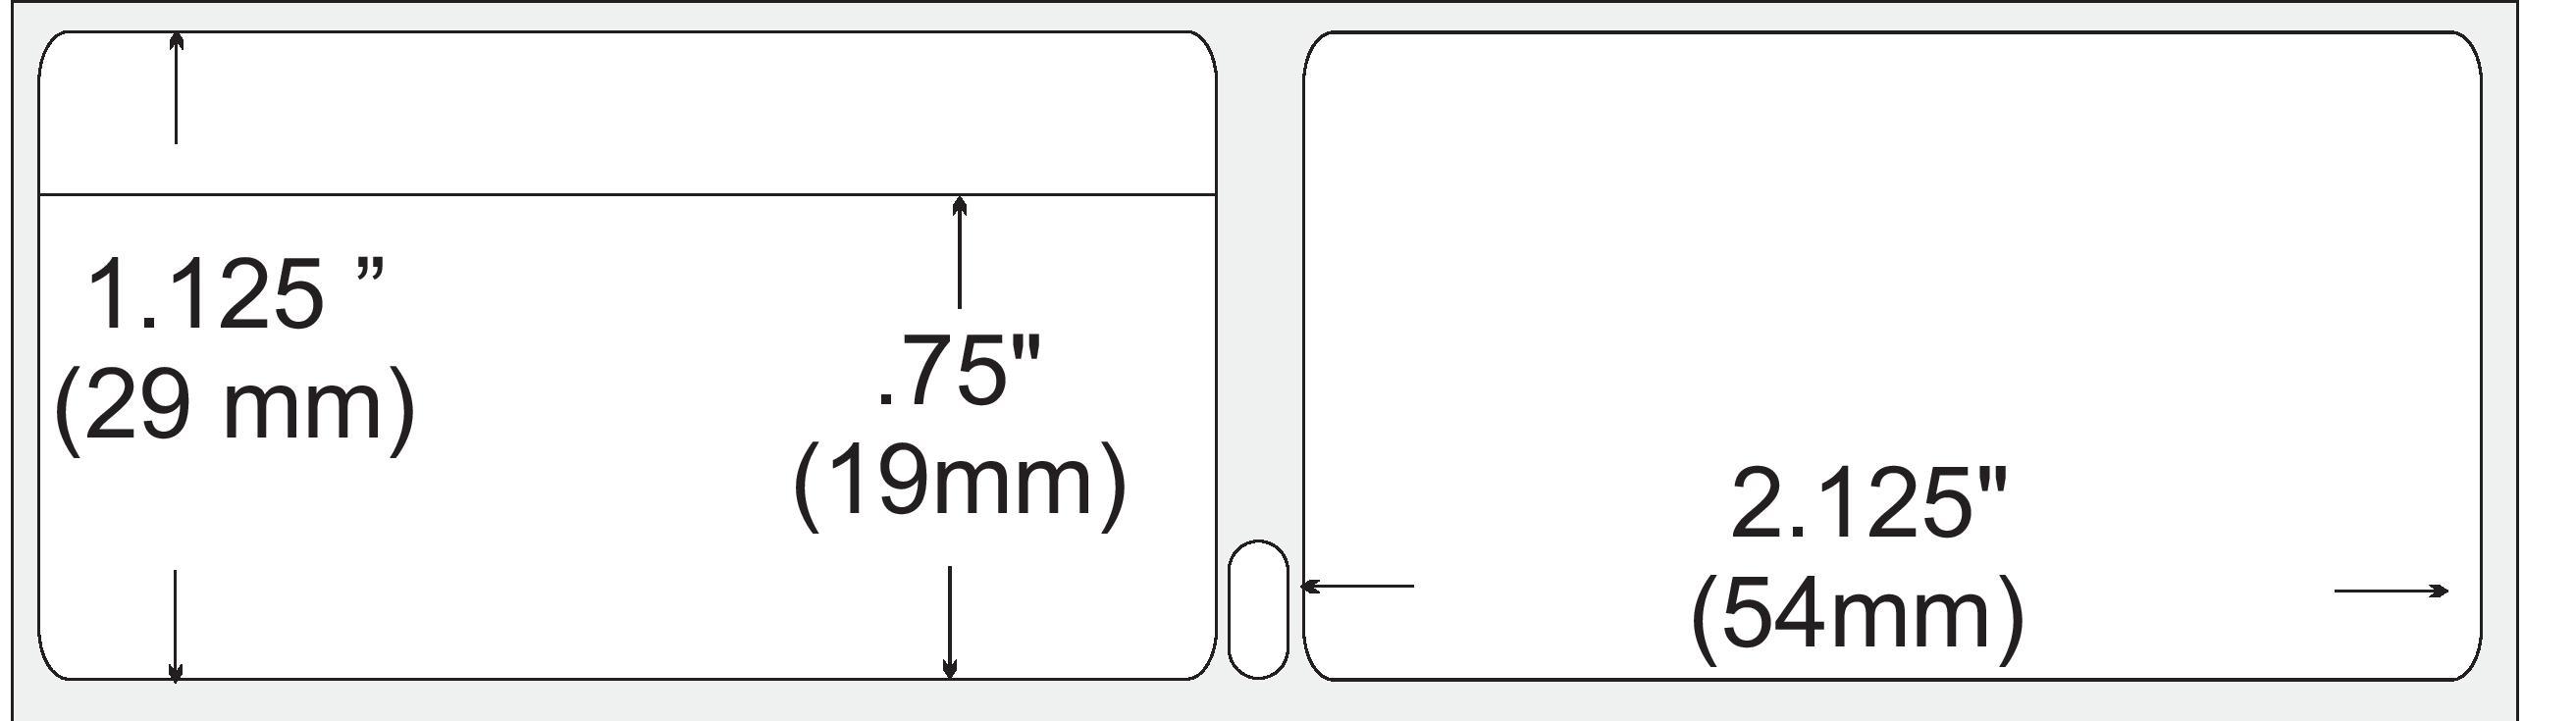 W-30330-BL-R-page-001